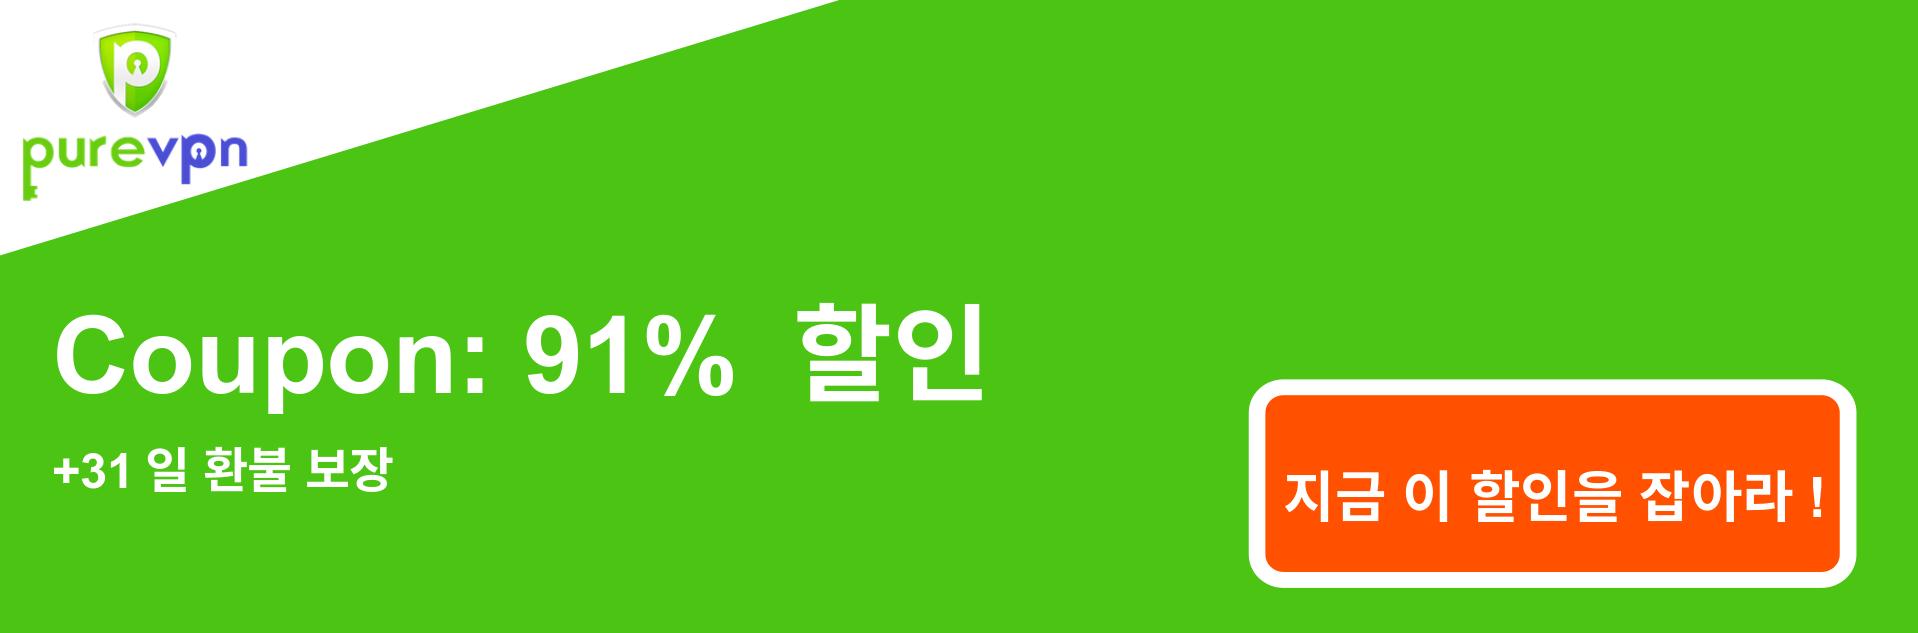 PureVPN 쿠폰 배너-91 % 할인